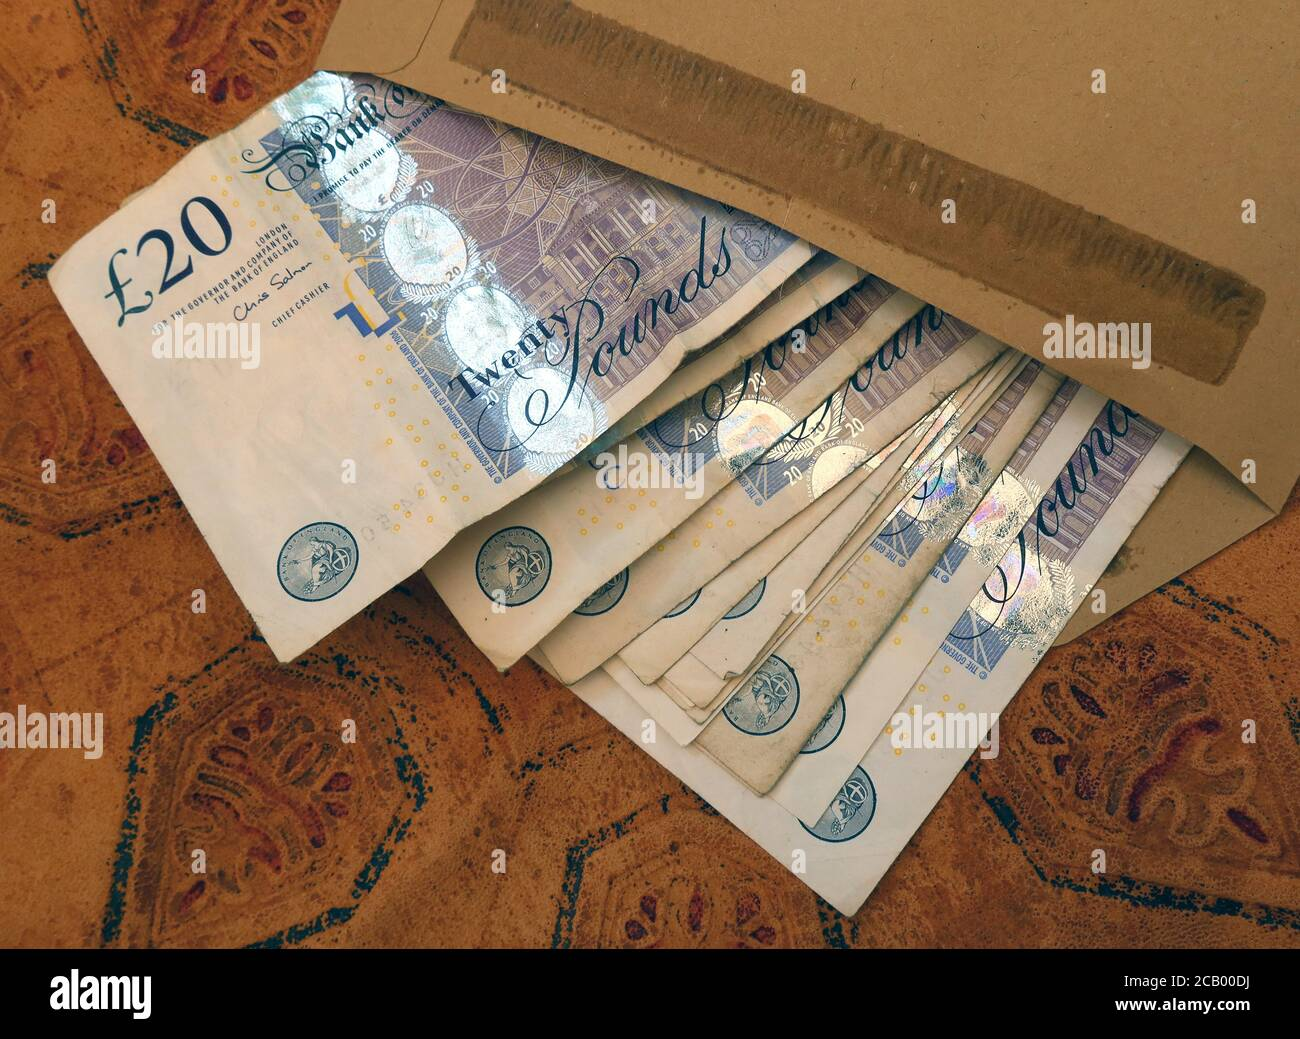 HotpixUK,@HotpixUK,GoTonySmith,Warrington,Cheshire,England,UK,note,notes,cash,sterling,currency,5 pound,10 pound,20 pound,cash money,economy,bribe,inducement,commission,payment,black economy,back hander,backhander,Scotland,Scottish money,back of a jeans pocket,Jeans,trouser,trousered,pocket,rear,back,envelope,brown envelope,British,Great Britain,hard currency,legal tender